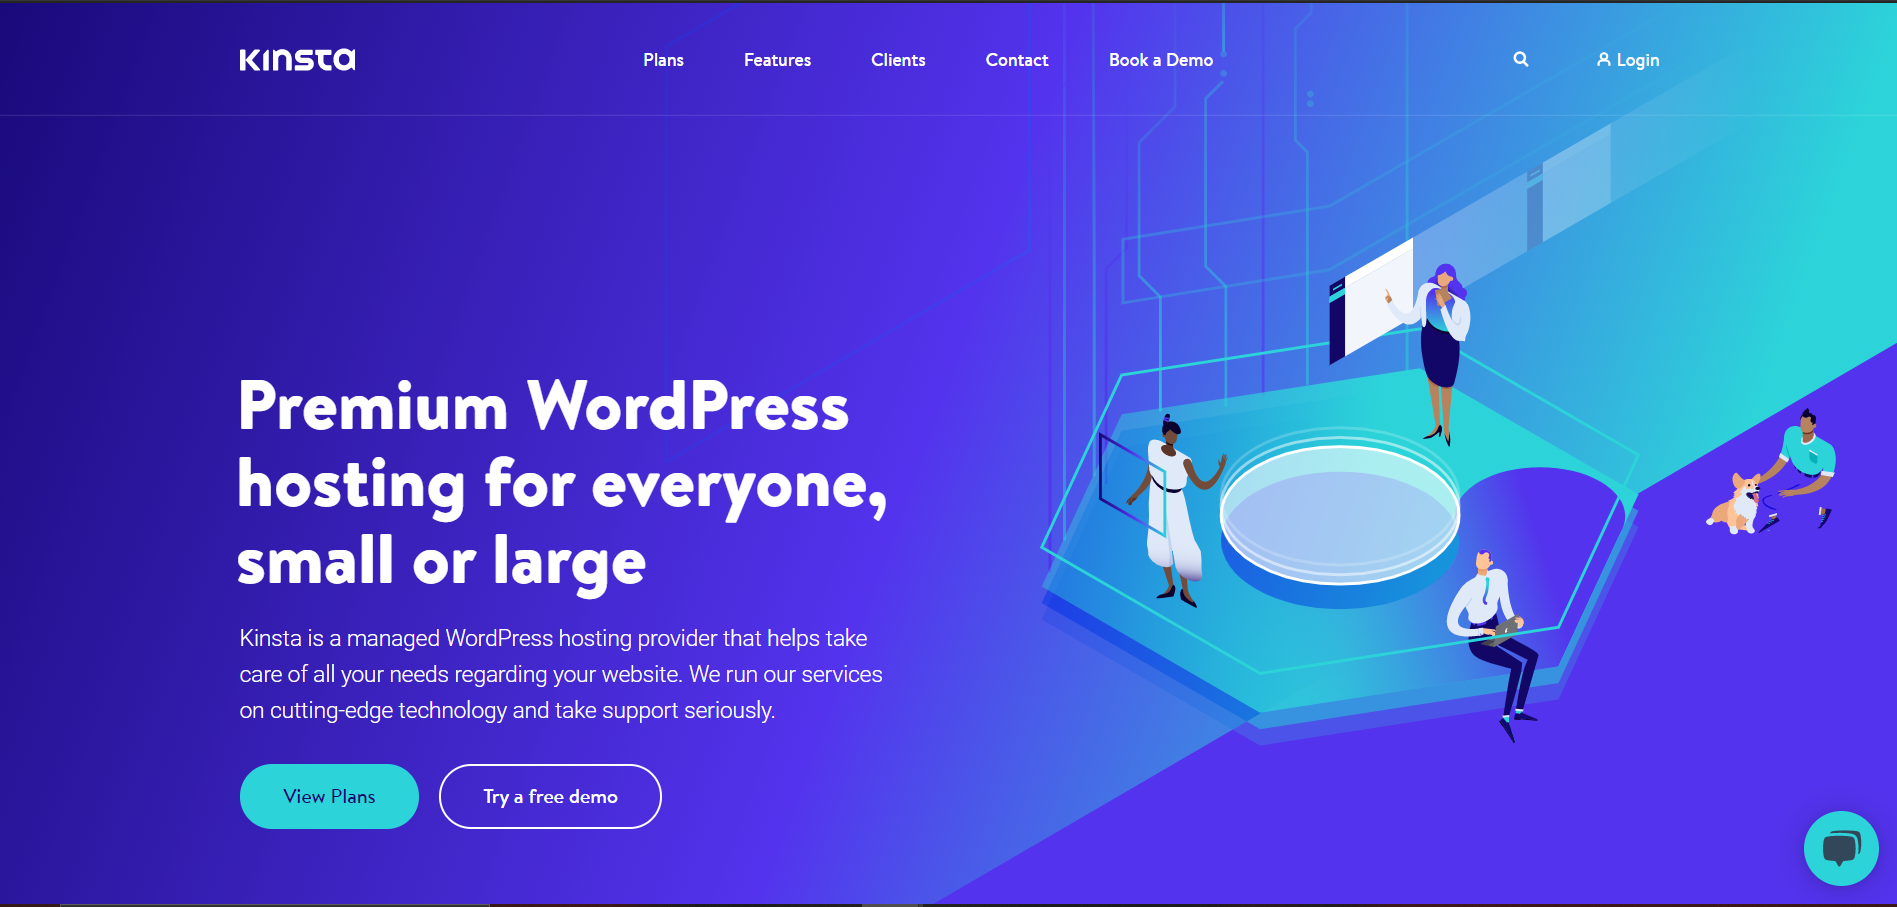 kinsta home page